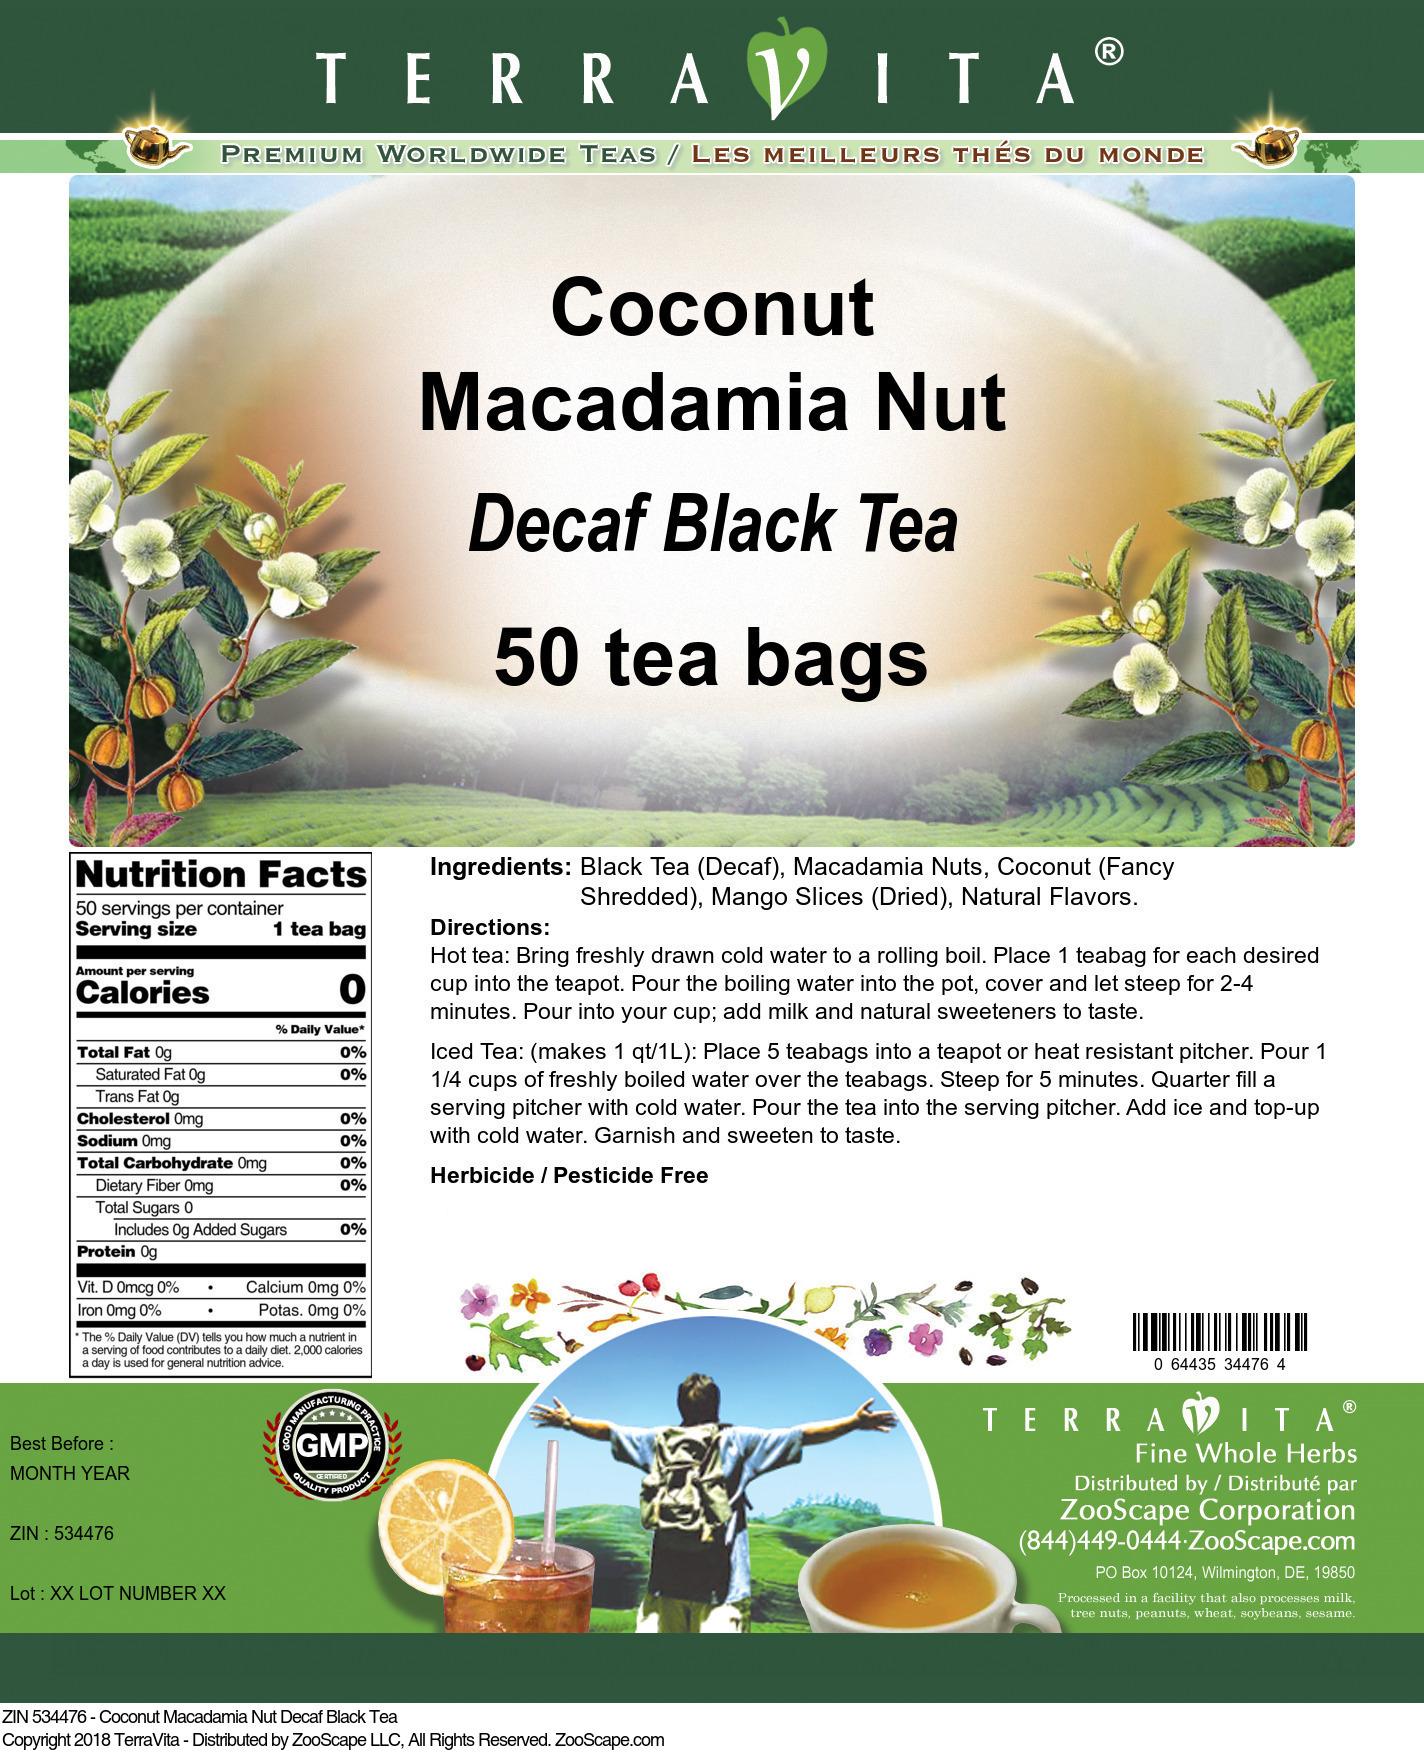 Coconut Macadamia Nut Decaf Black Tea